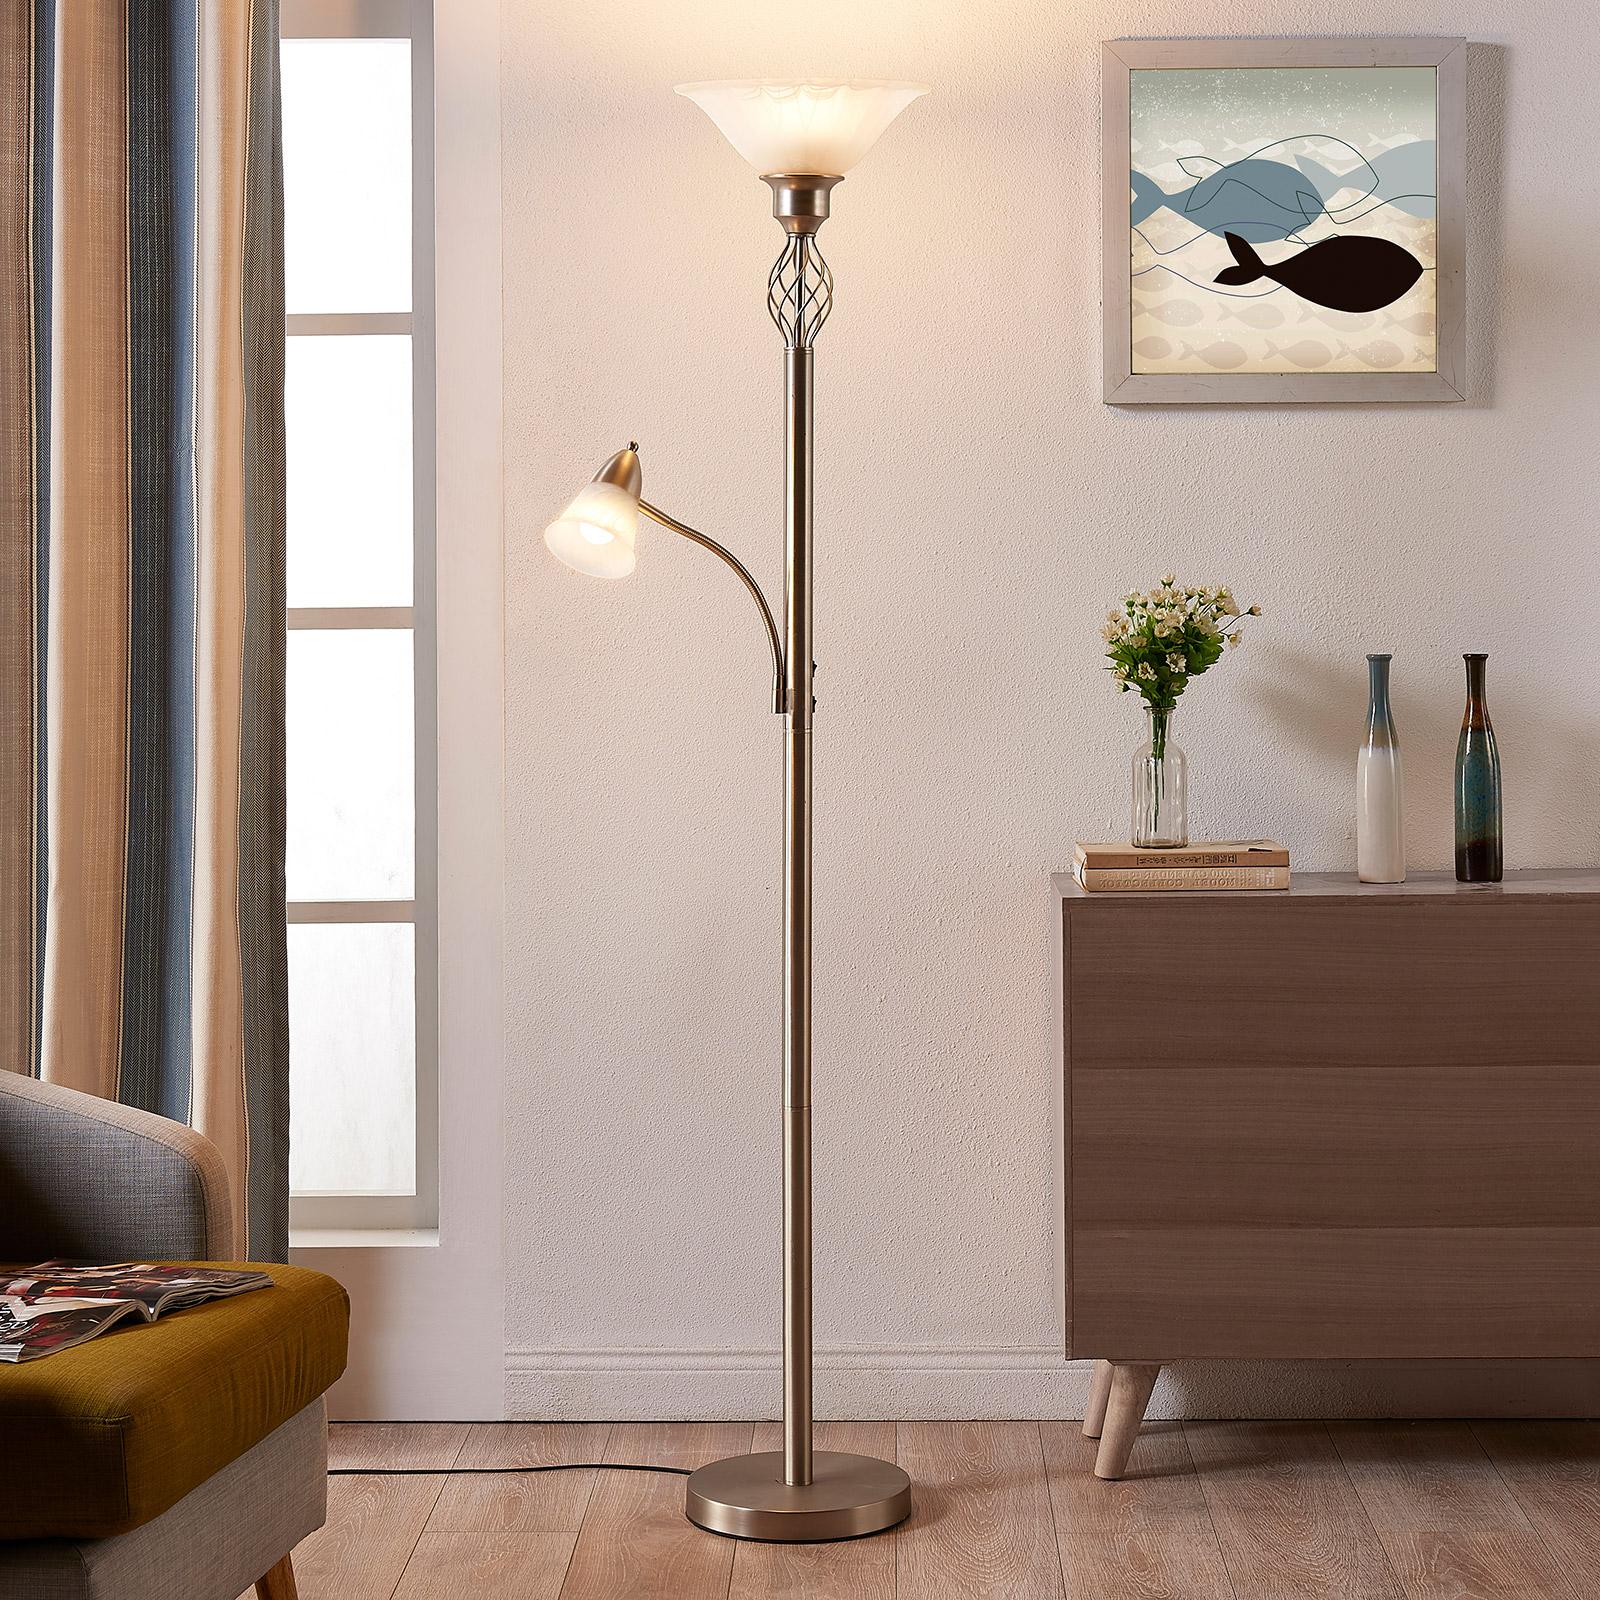 Lampa stojąca LED Dunja, nikiel